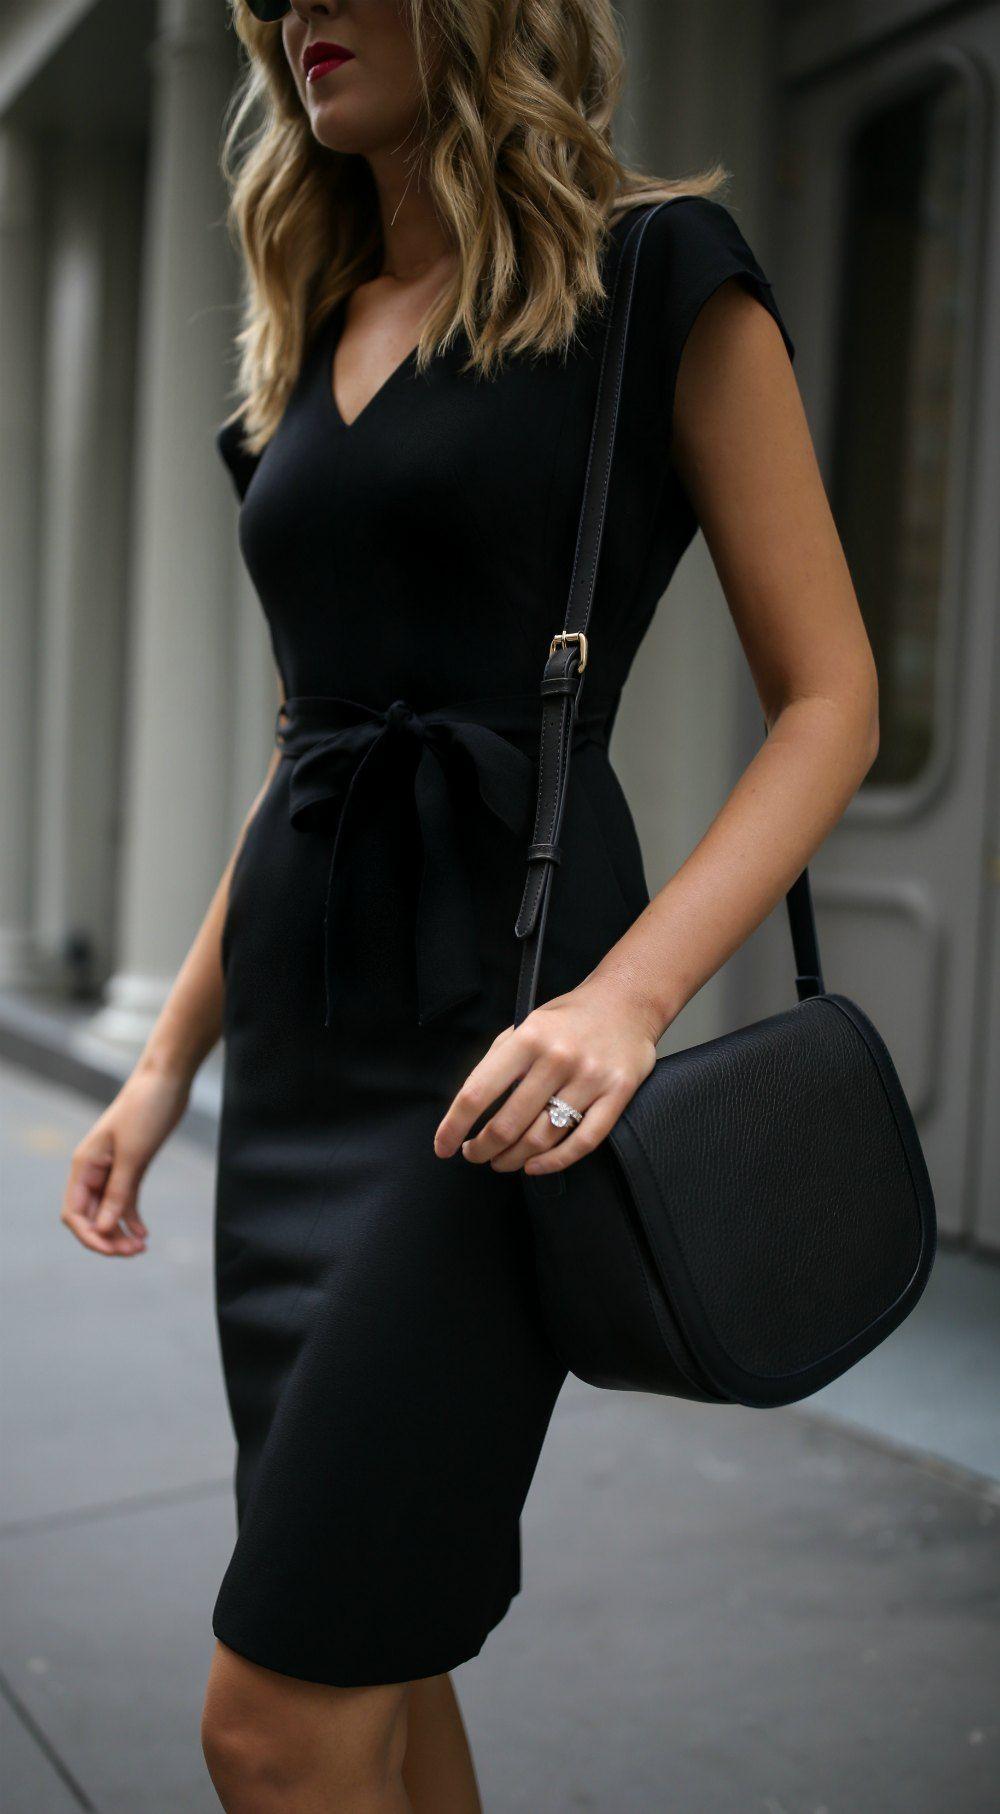 Classic Black Sheath Dress Ankle Strap Black Pumps Eliza J Sam Edelman Affordable Workwear Under 100 Of Black Dresses Classy Black Sheath Dress Fashion [ 1814 x 1000 Pixel ]